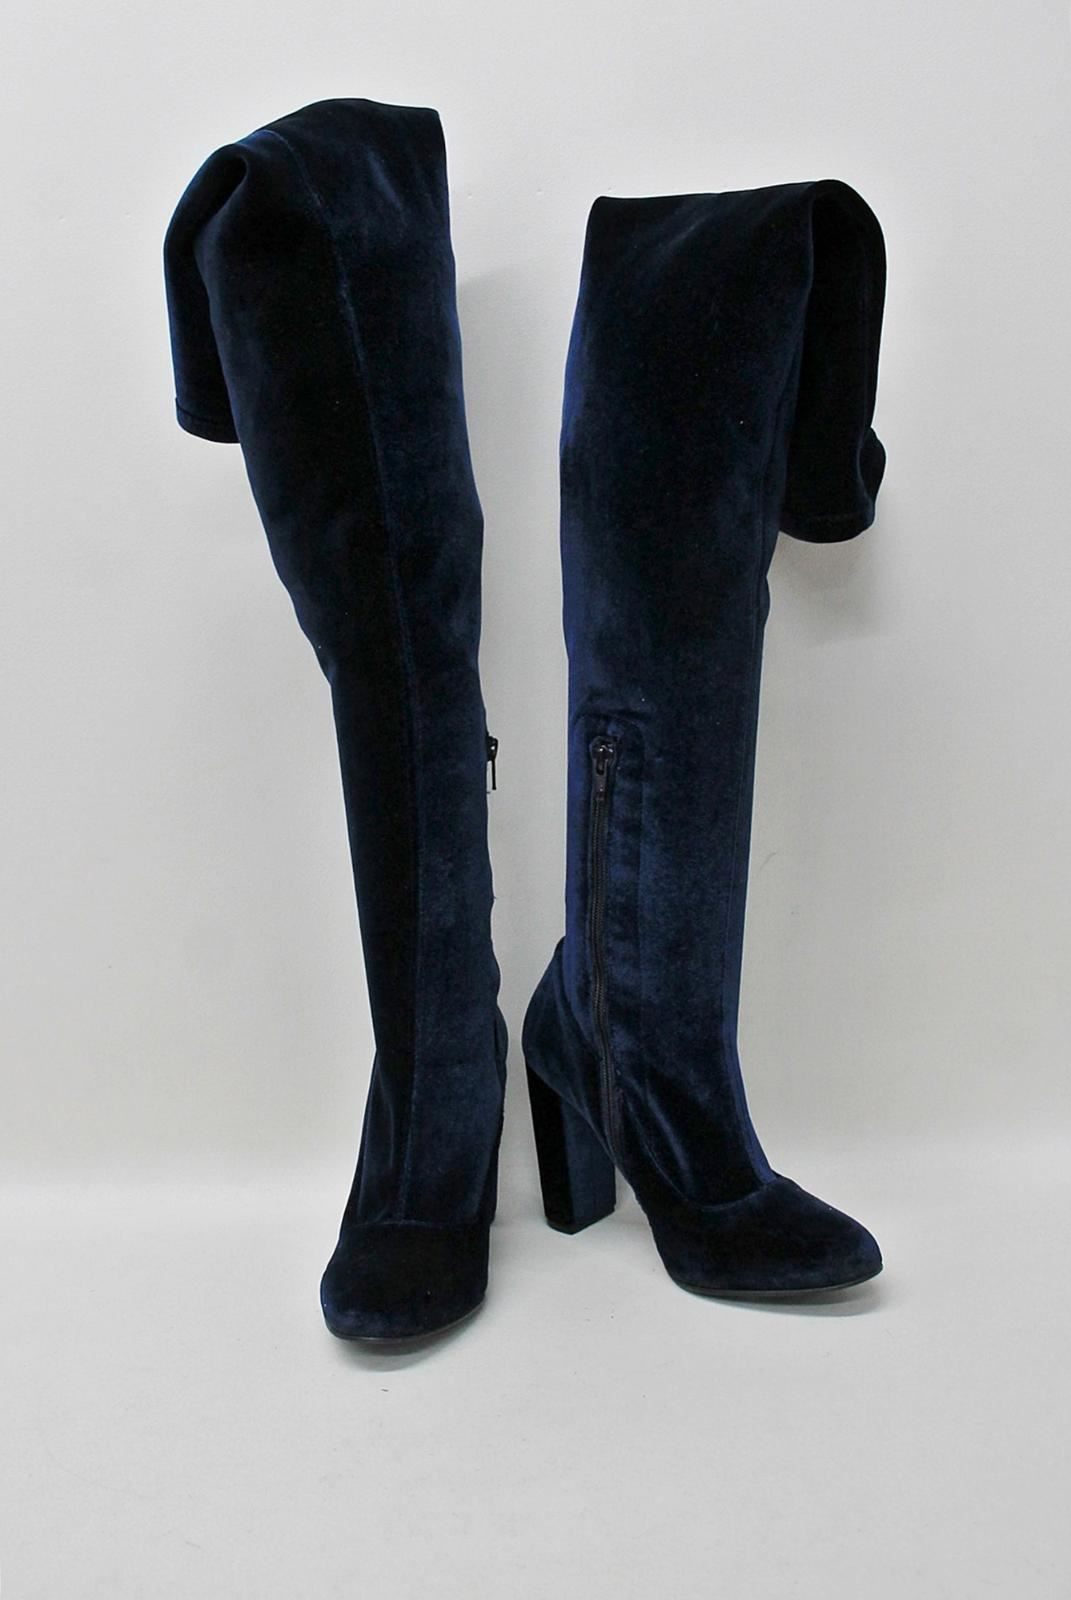 CARVELA-KURT-GEIGER-Ladies-Navy-Blue-Velvet-Round-Toe-Over-Knee-Boots-EU40-UK7